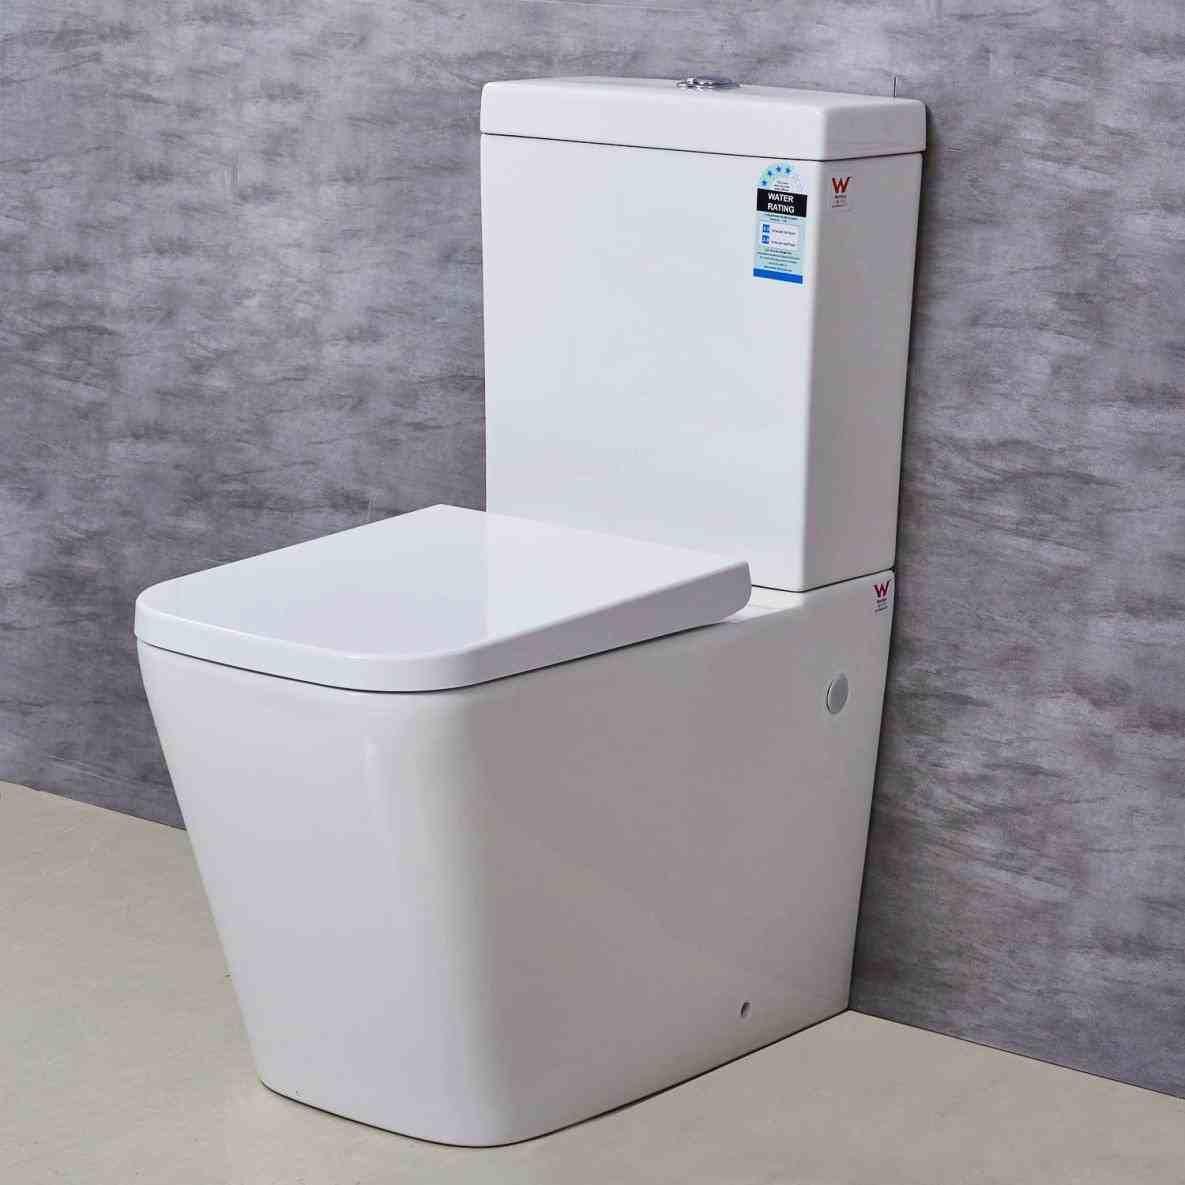 New Post toilet appliances visit bathroomremodelideass.club | Home ...